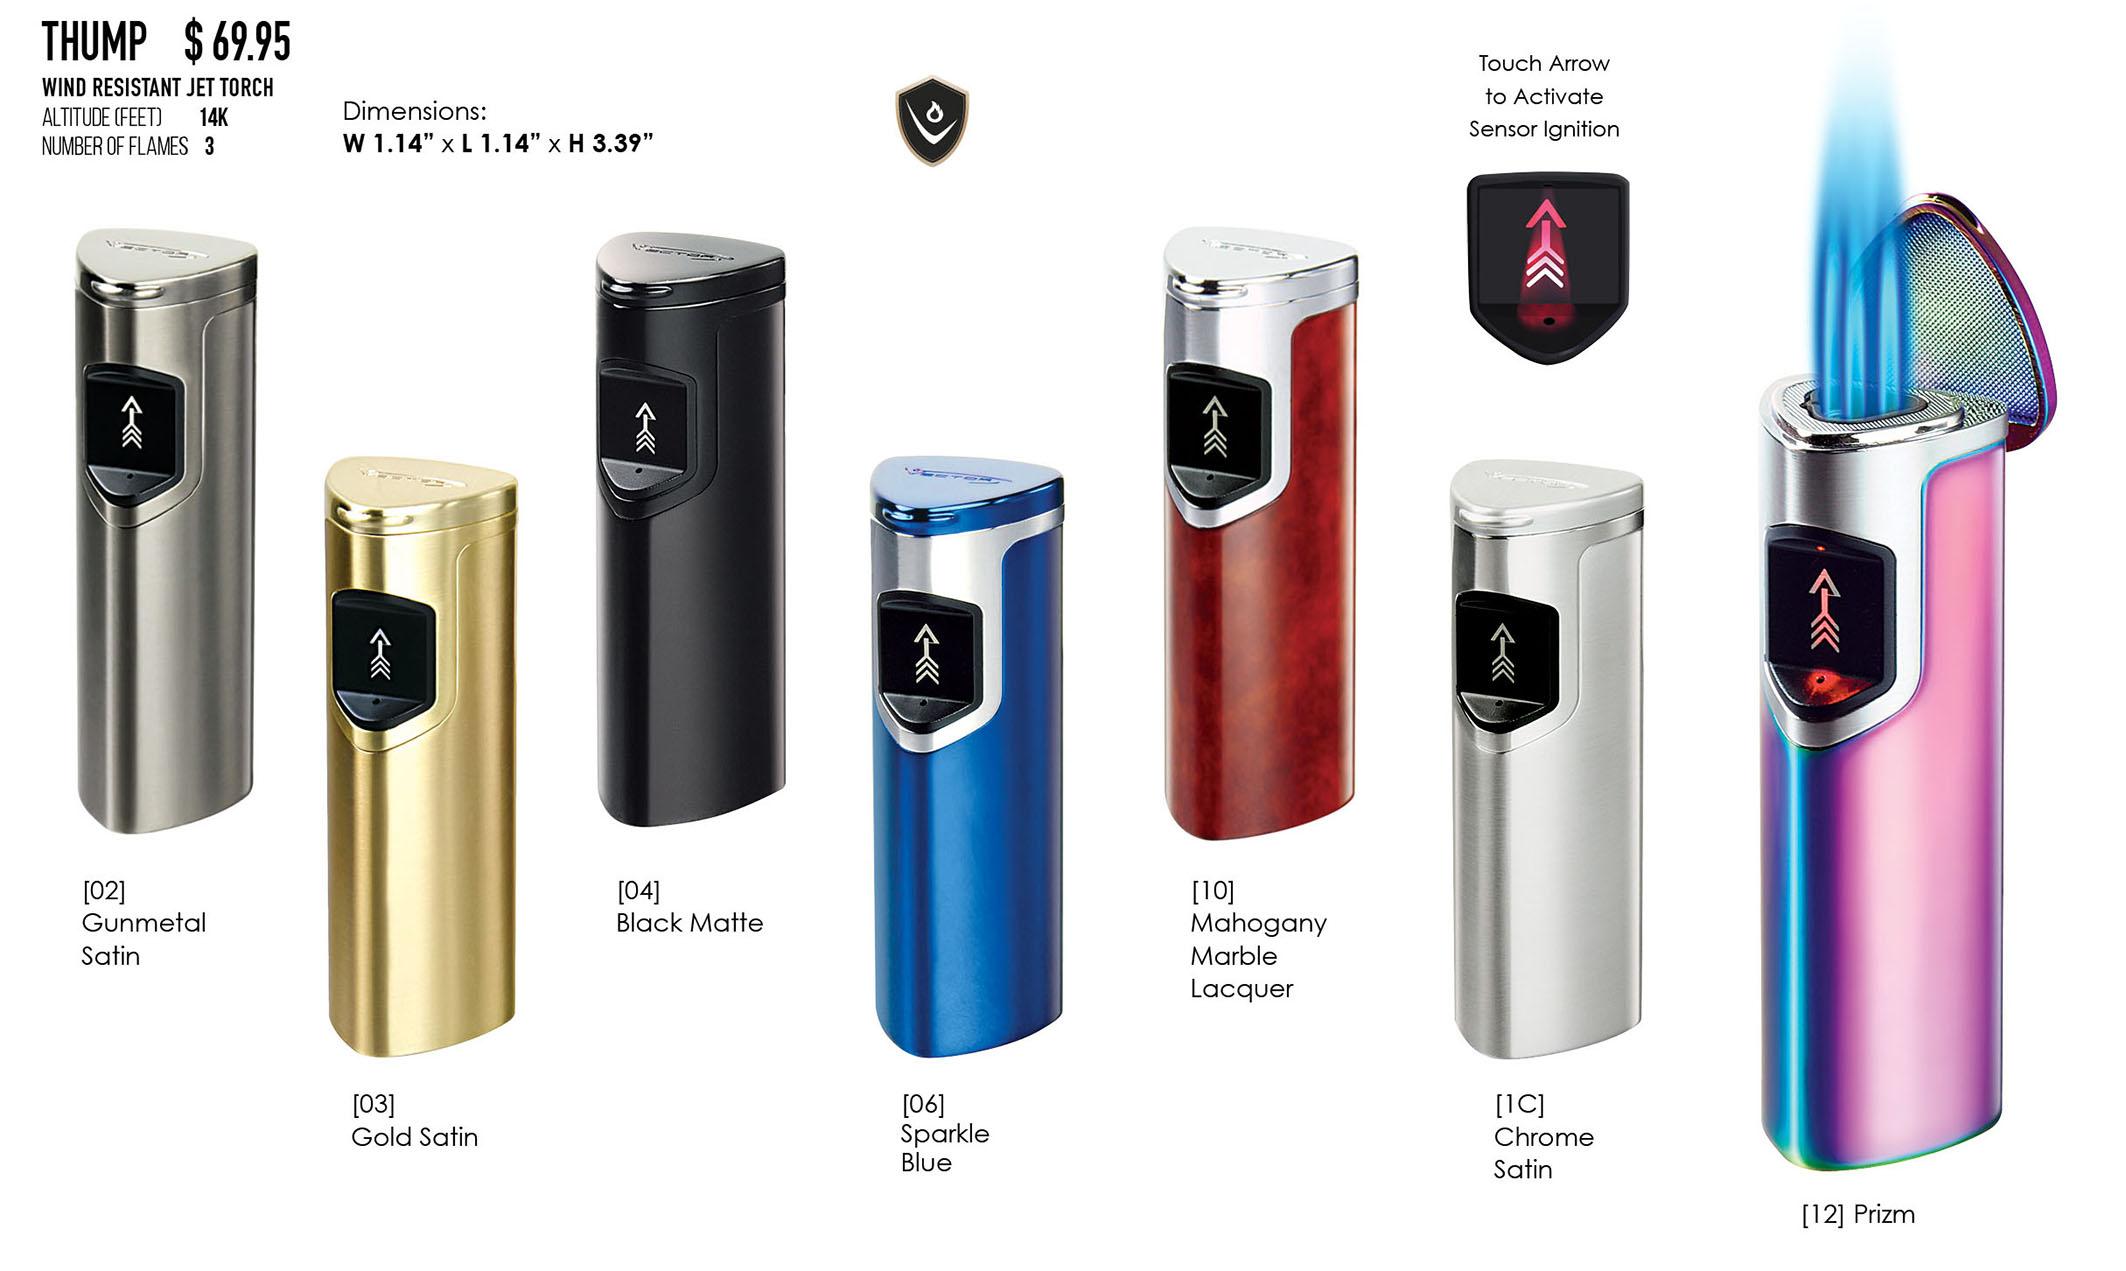 2126x1271 Pocket Lighters Thump Vectorkgm Official Website Of